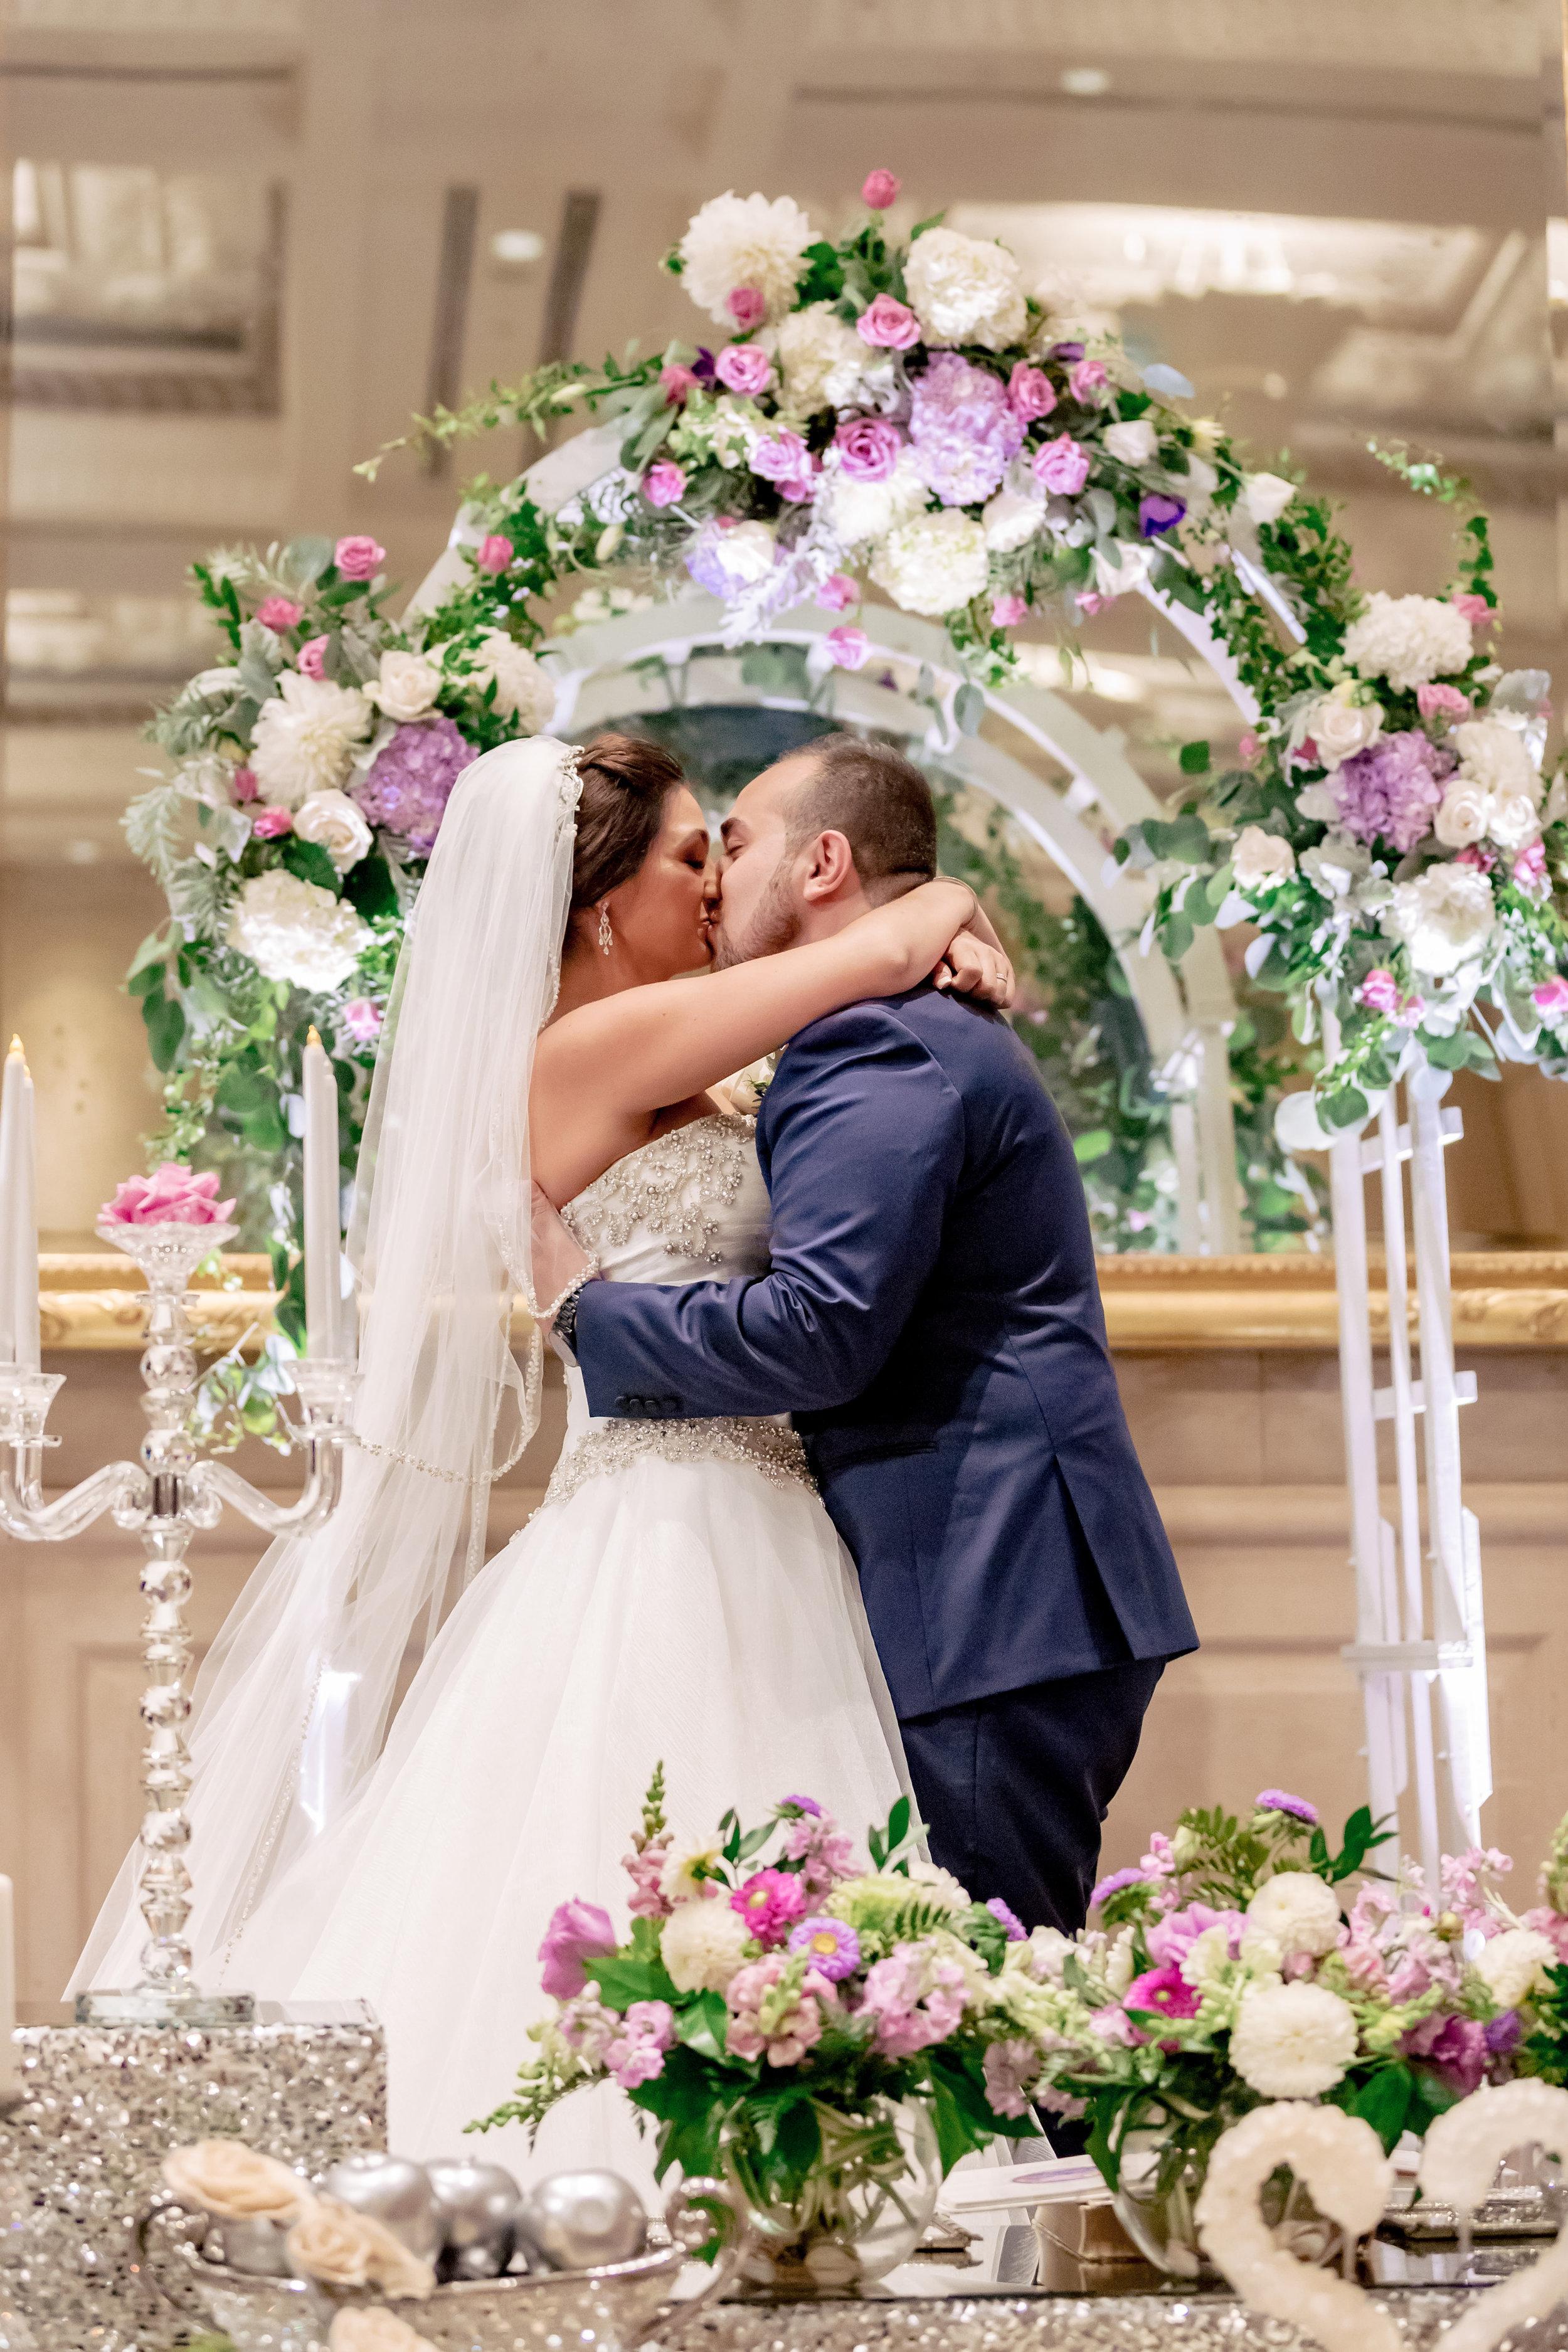 www.santabarbarawedding.com | Bacara Resort | Rewind Photography | Elegant Sofreh Design | Bride and Groom | Ceremony